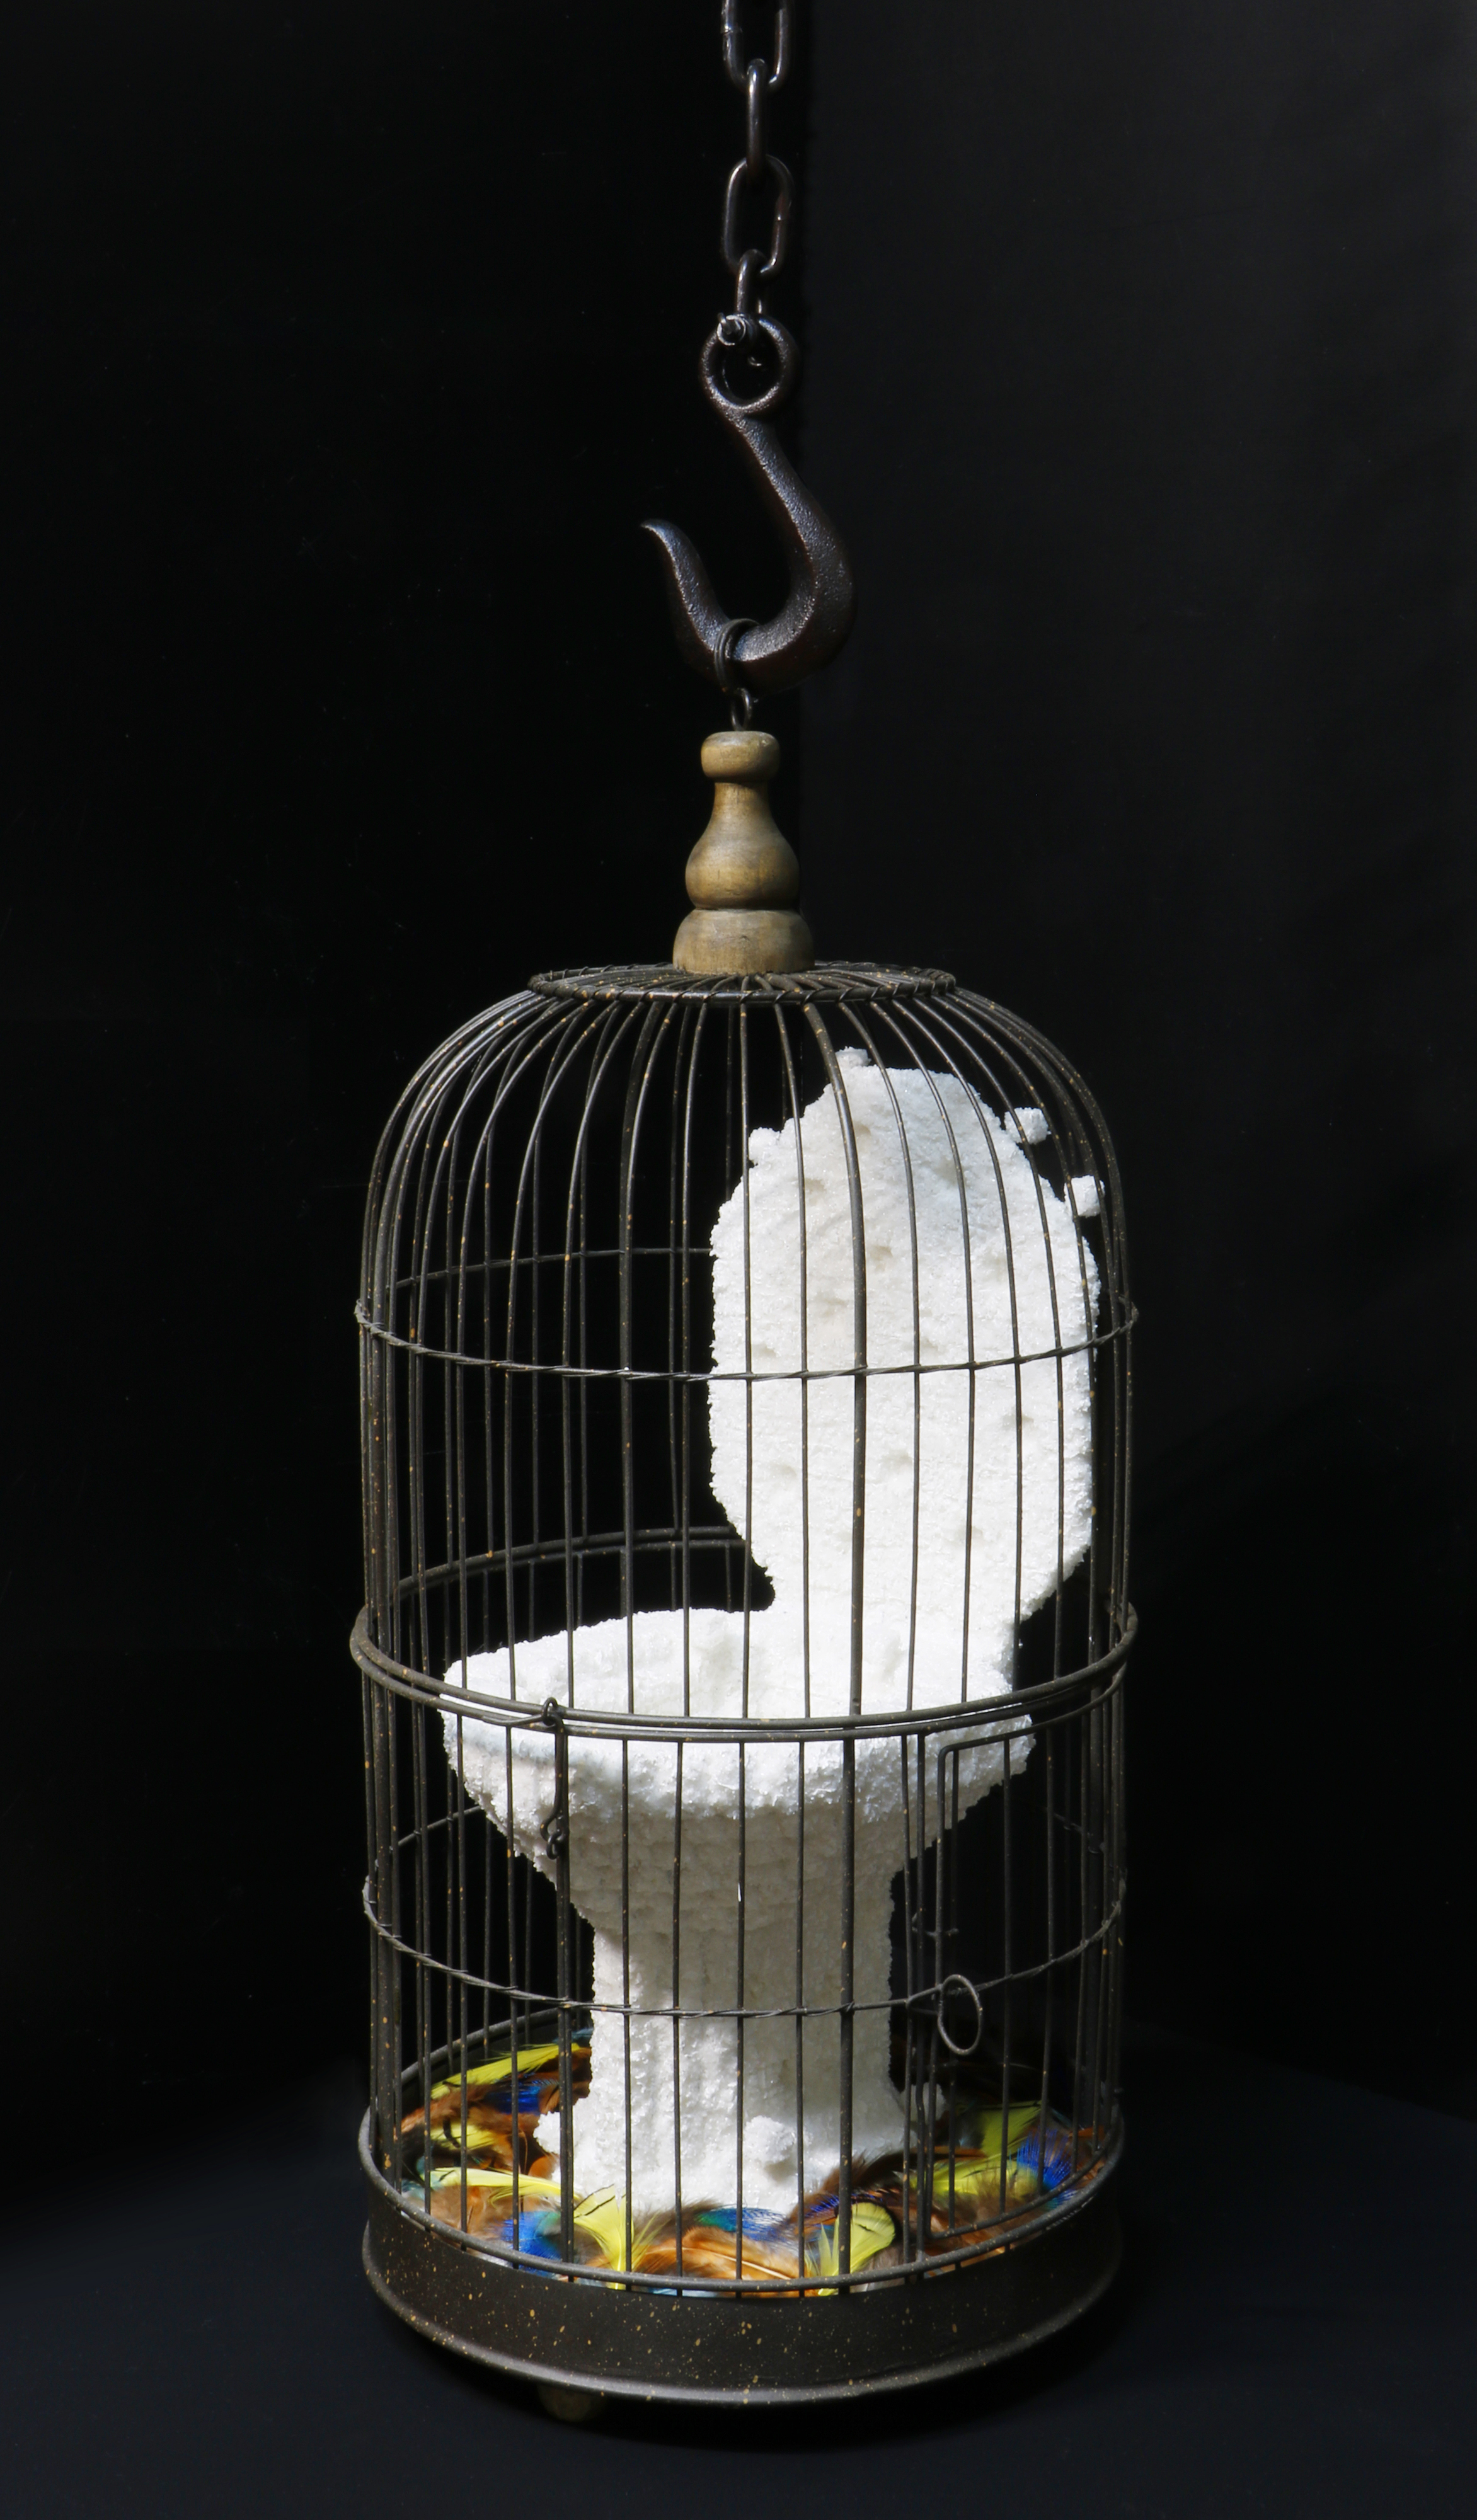 Toilet & Birdcage